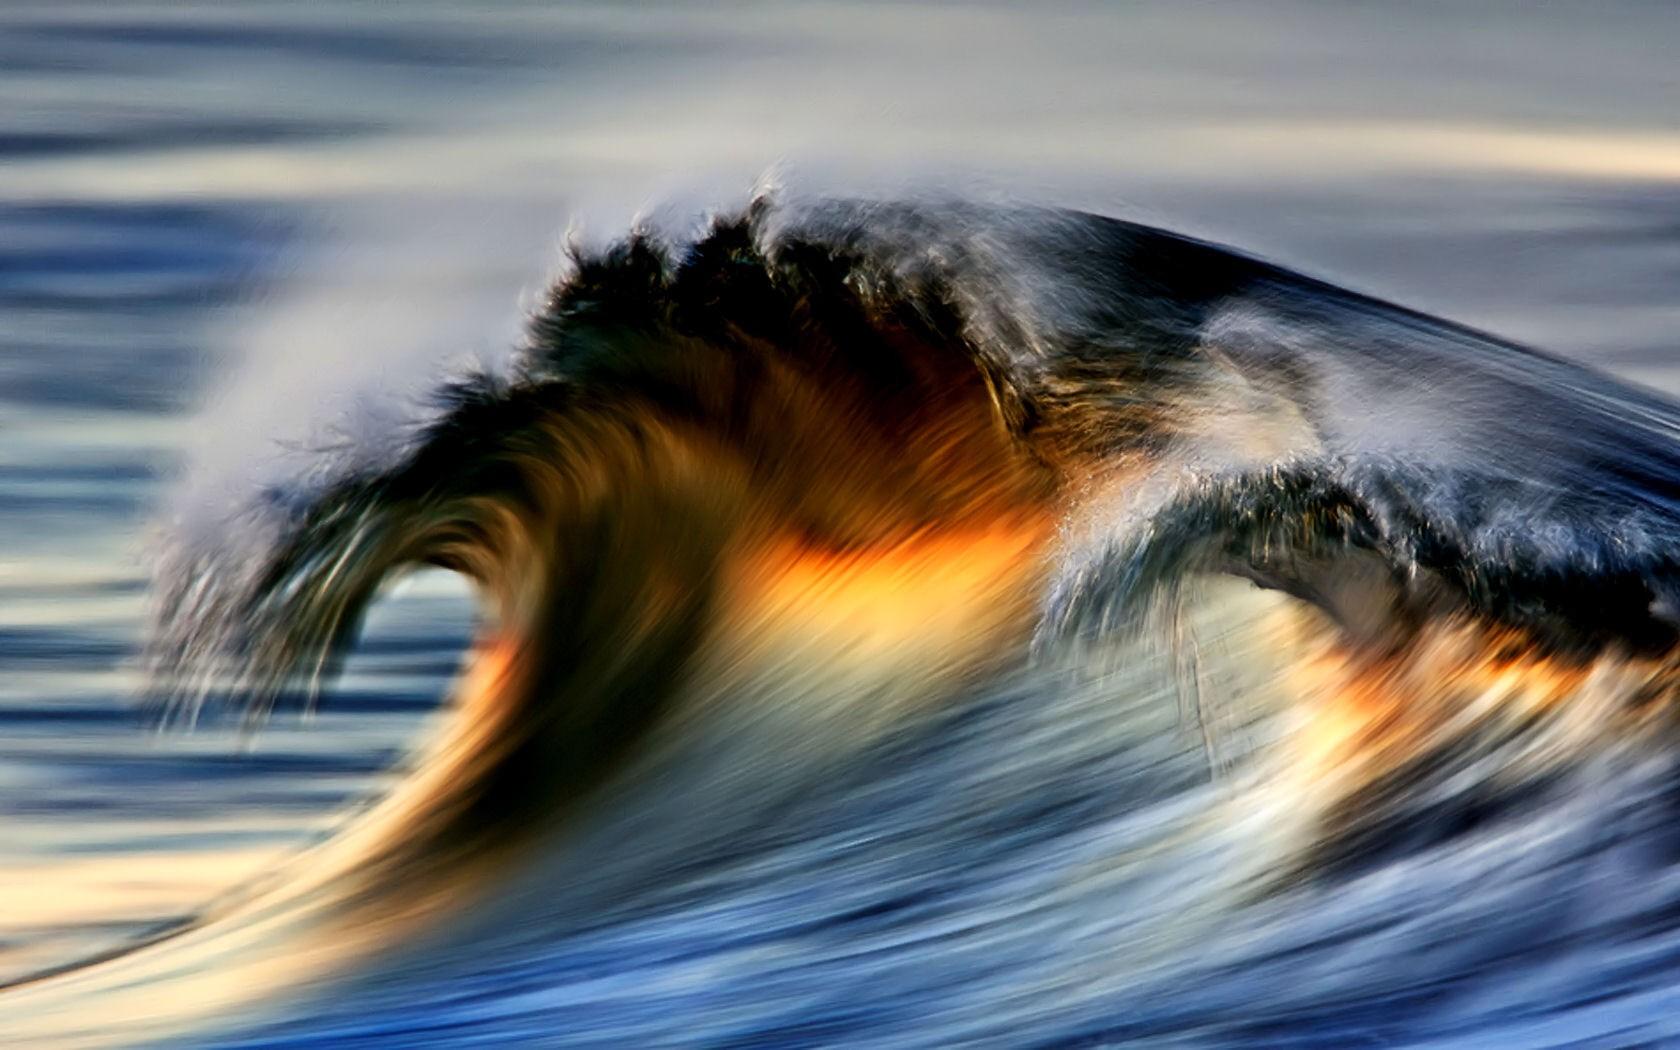 ocean waves wallpaper 862931 ocean waves wallpaper 862952 ocean waves 1680x1050